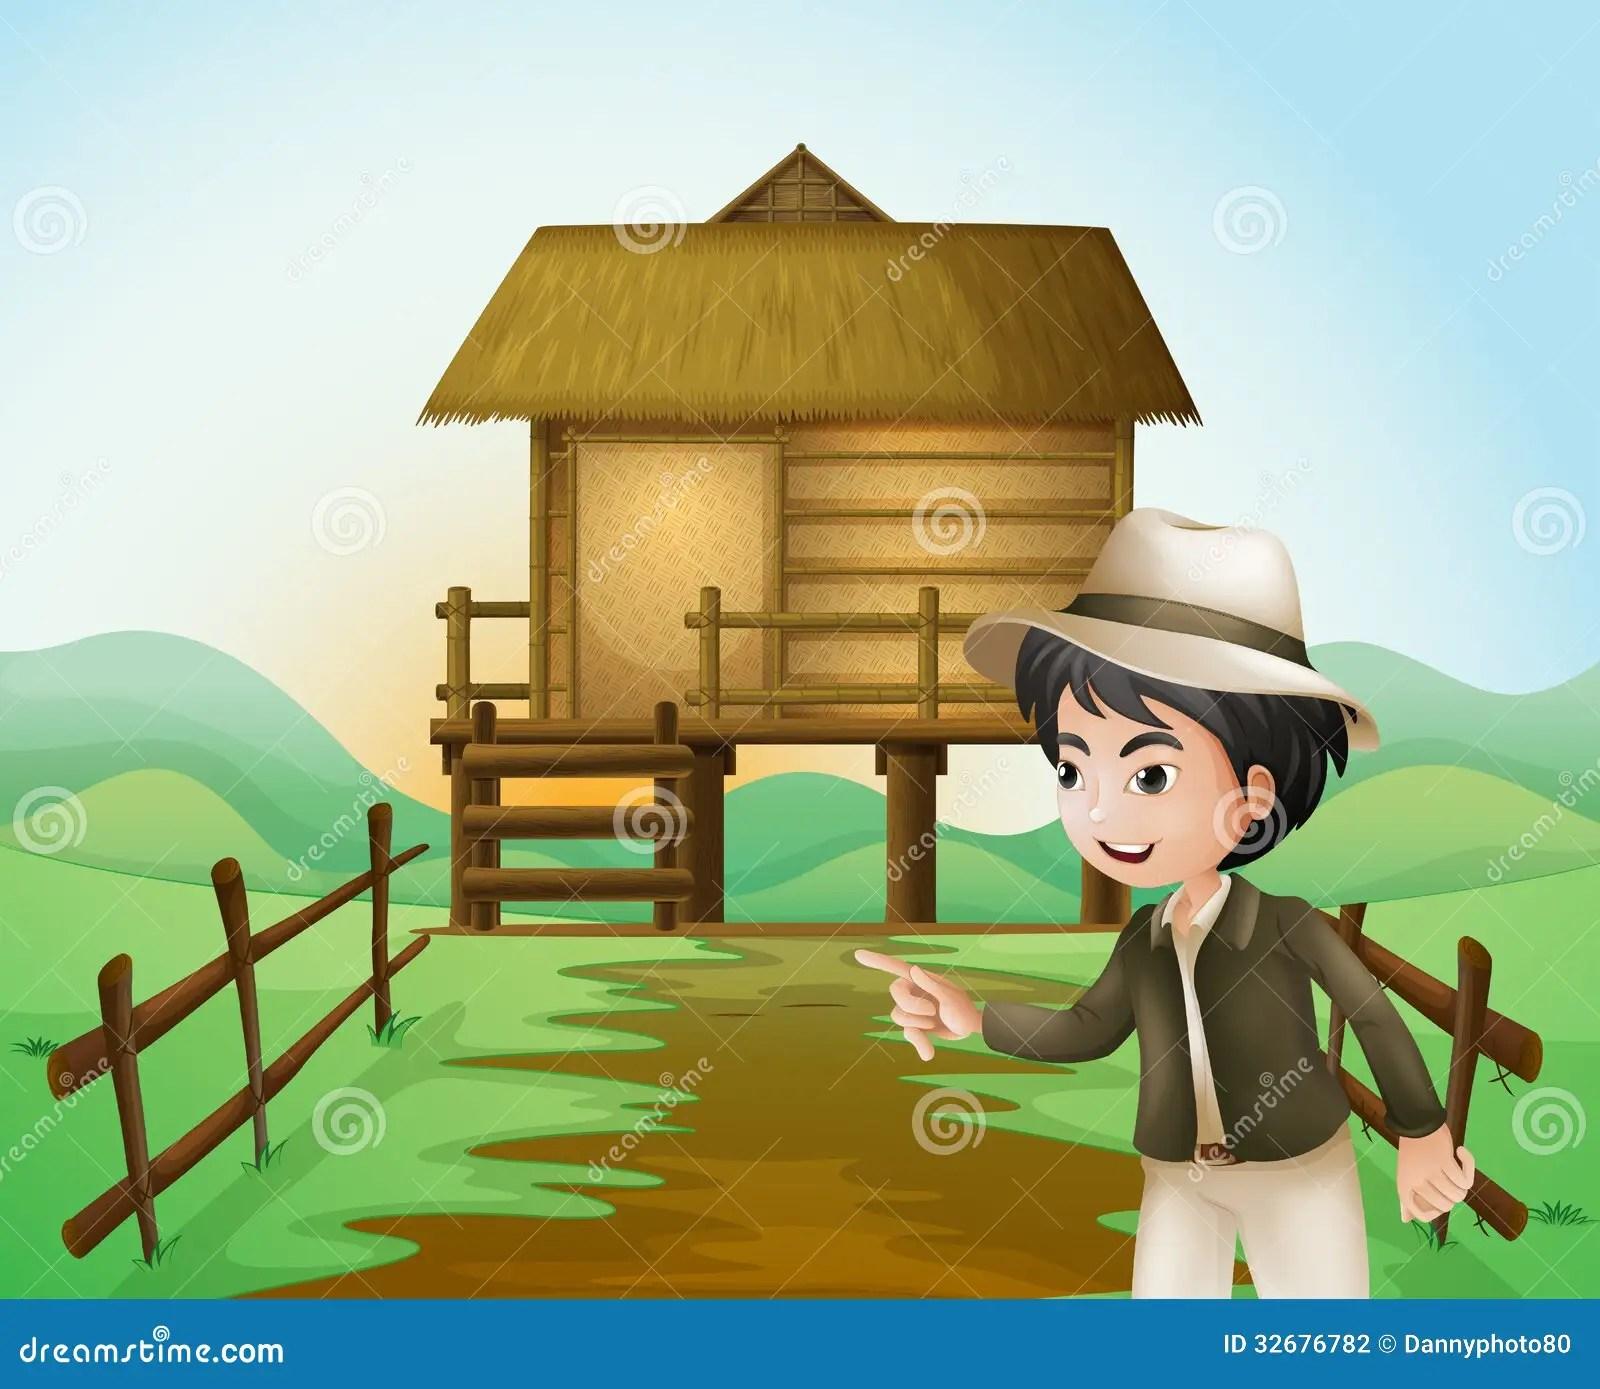 A Farm With Nipa Huts Vector Illustration CartoonDealer